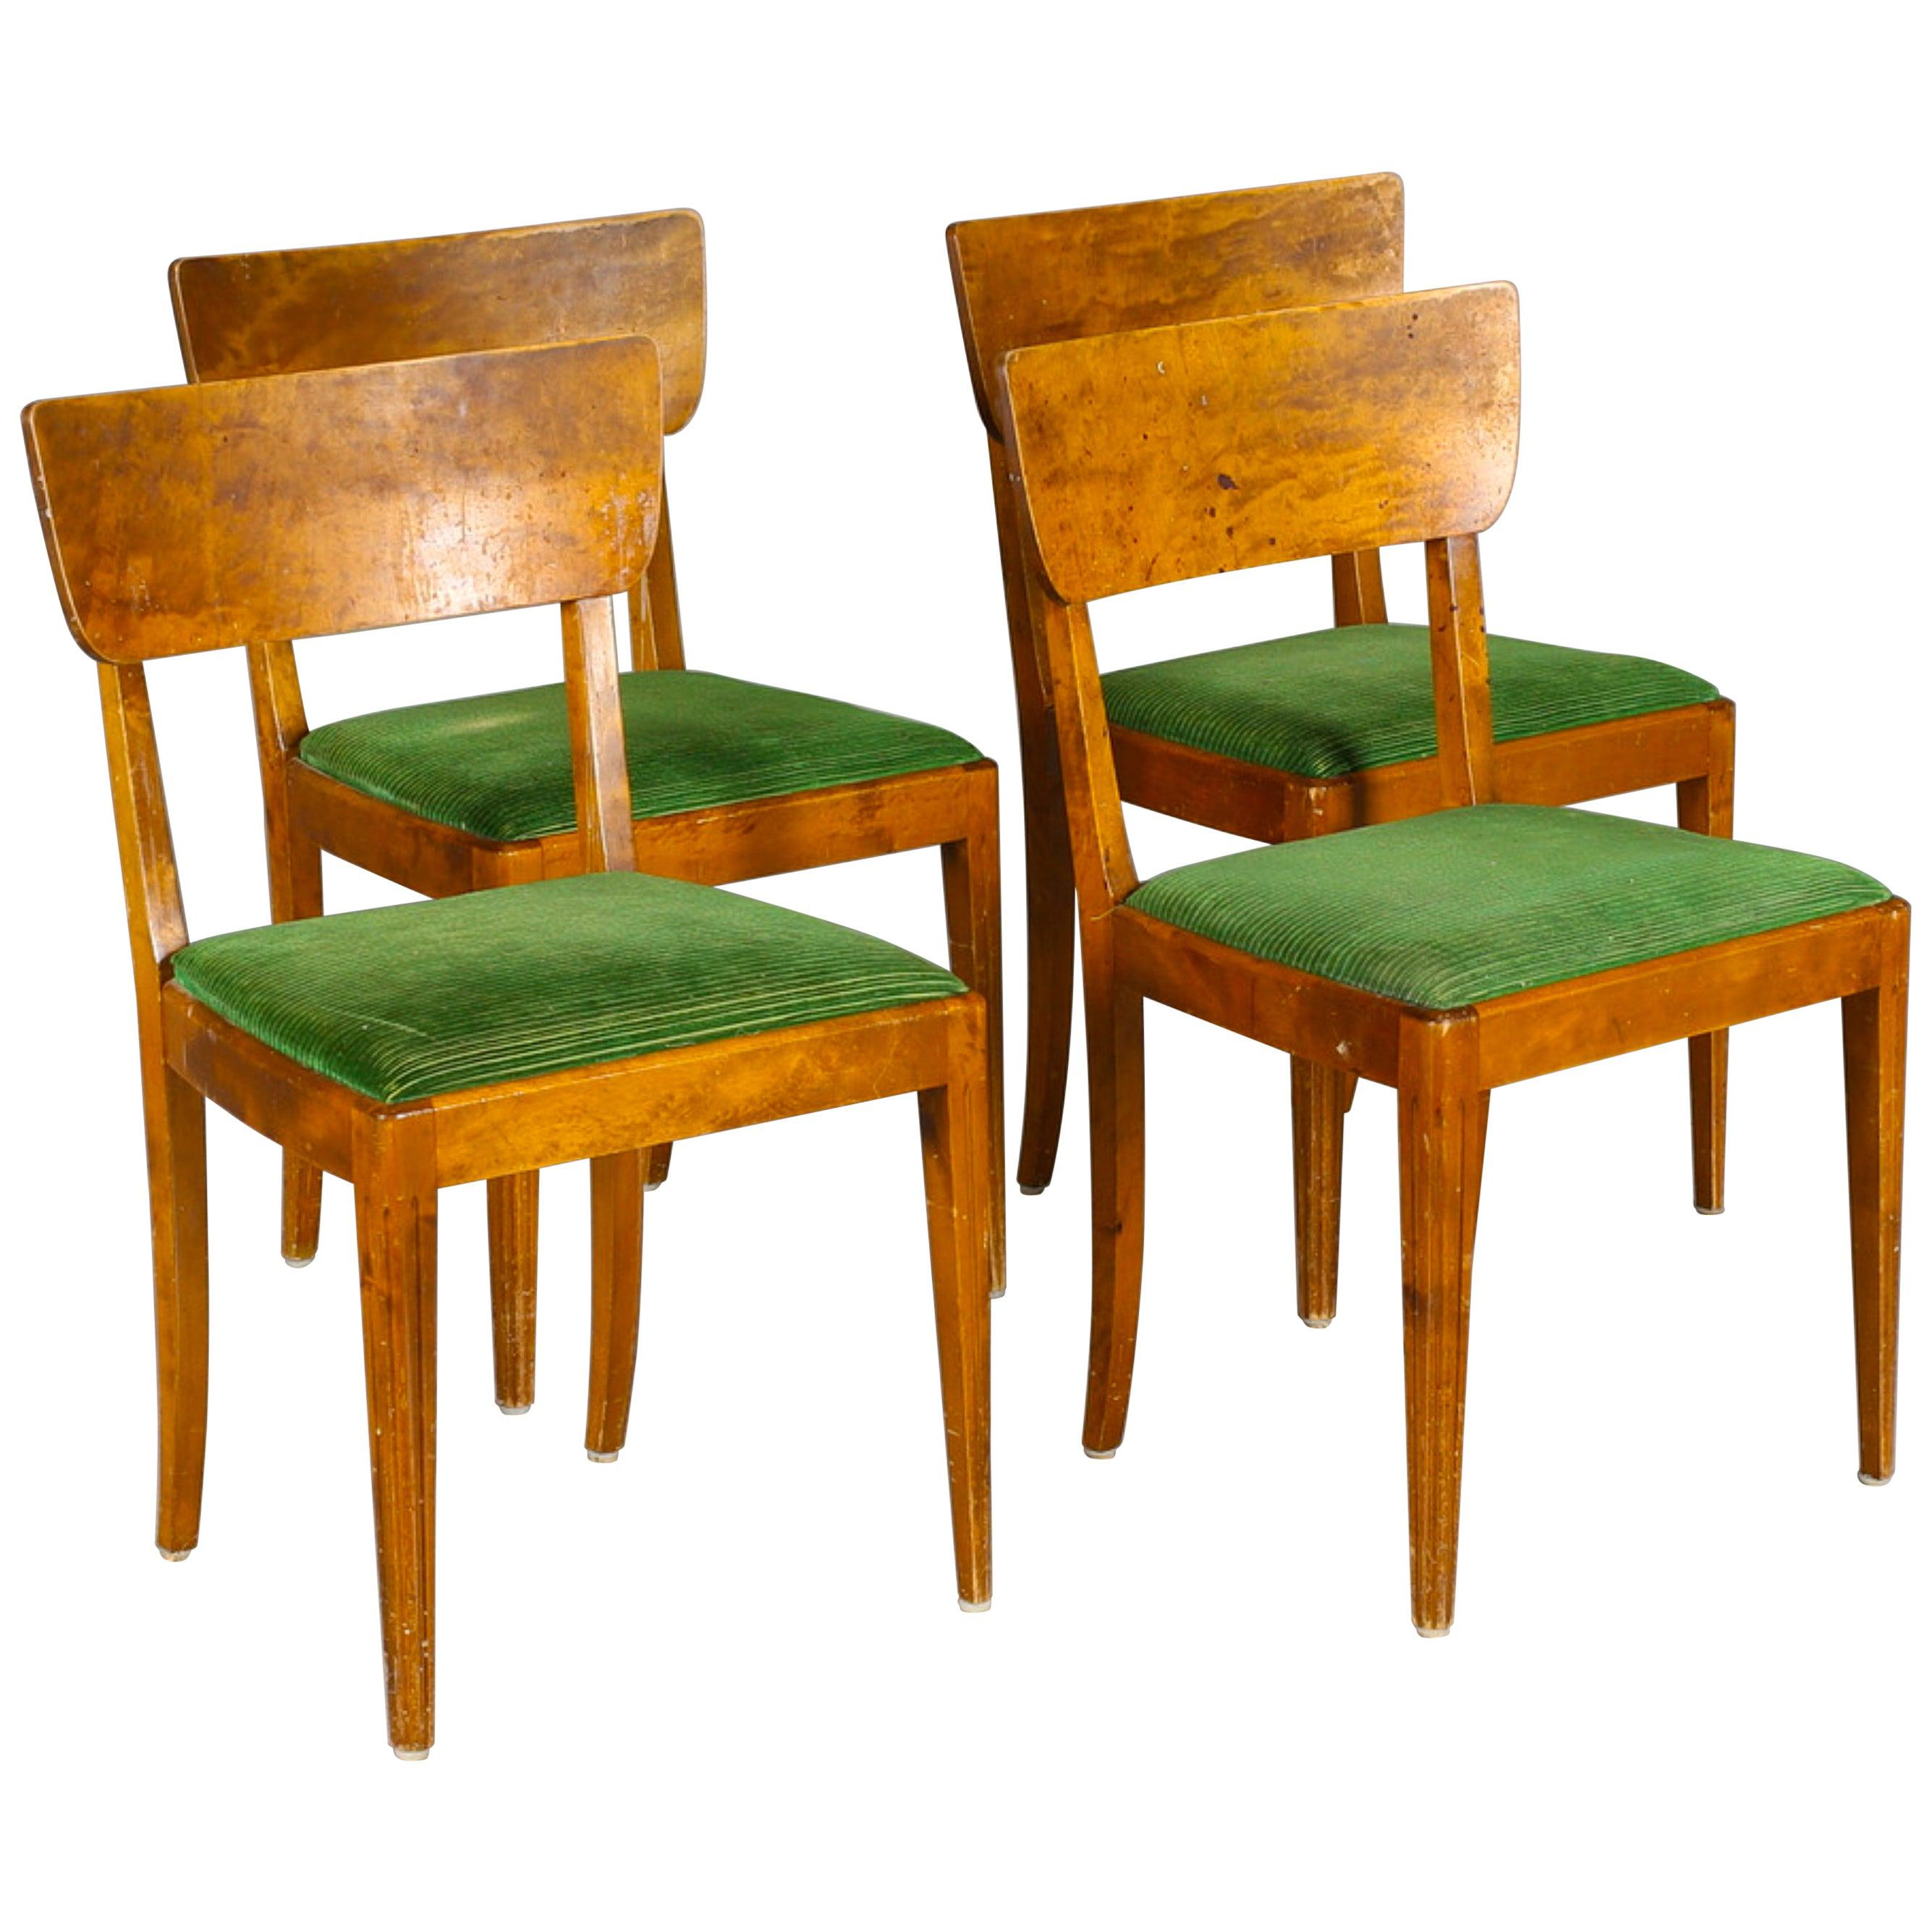 Art Deco Swedish Dining Chairs Set of 4 1930s Biedermeier